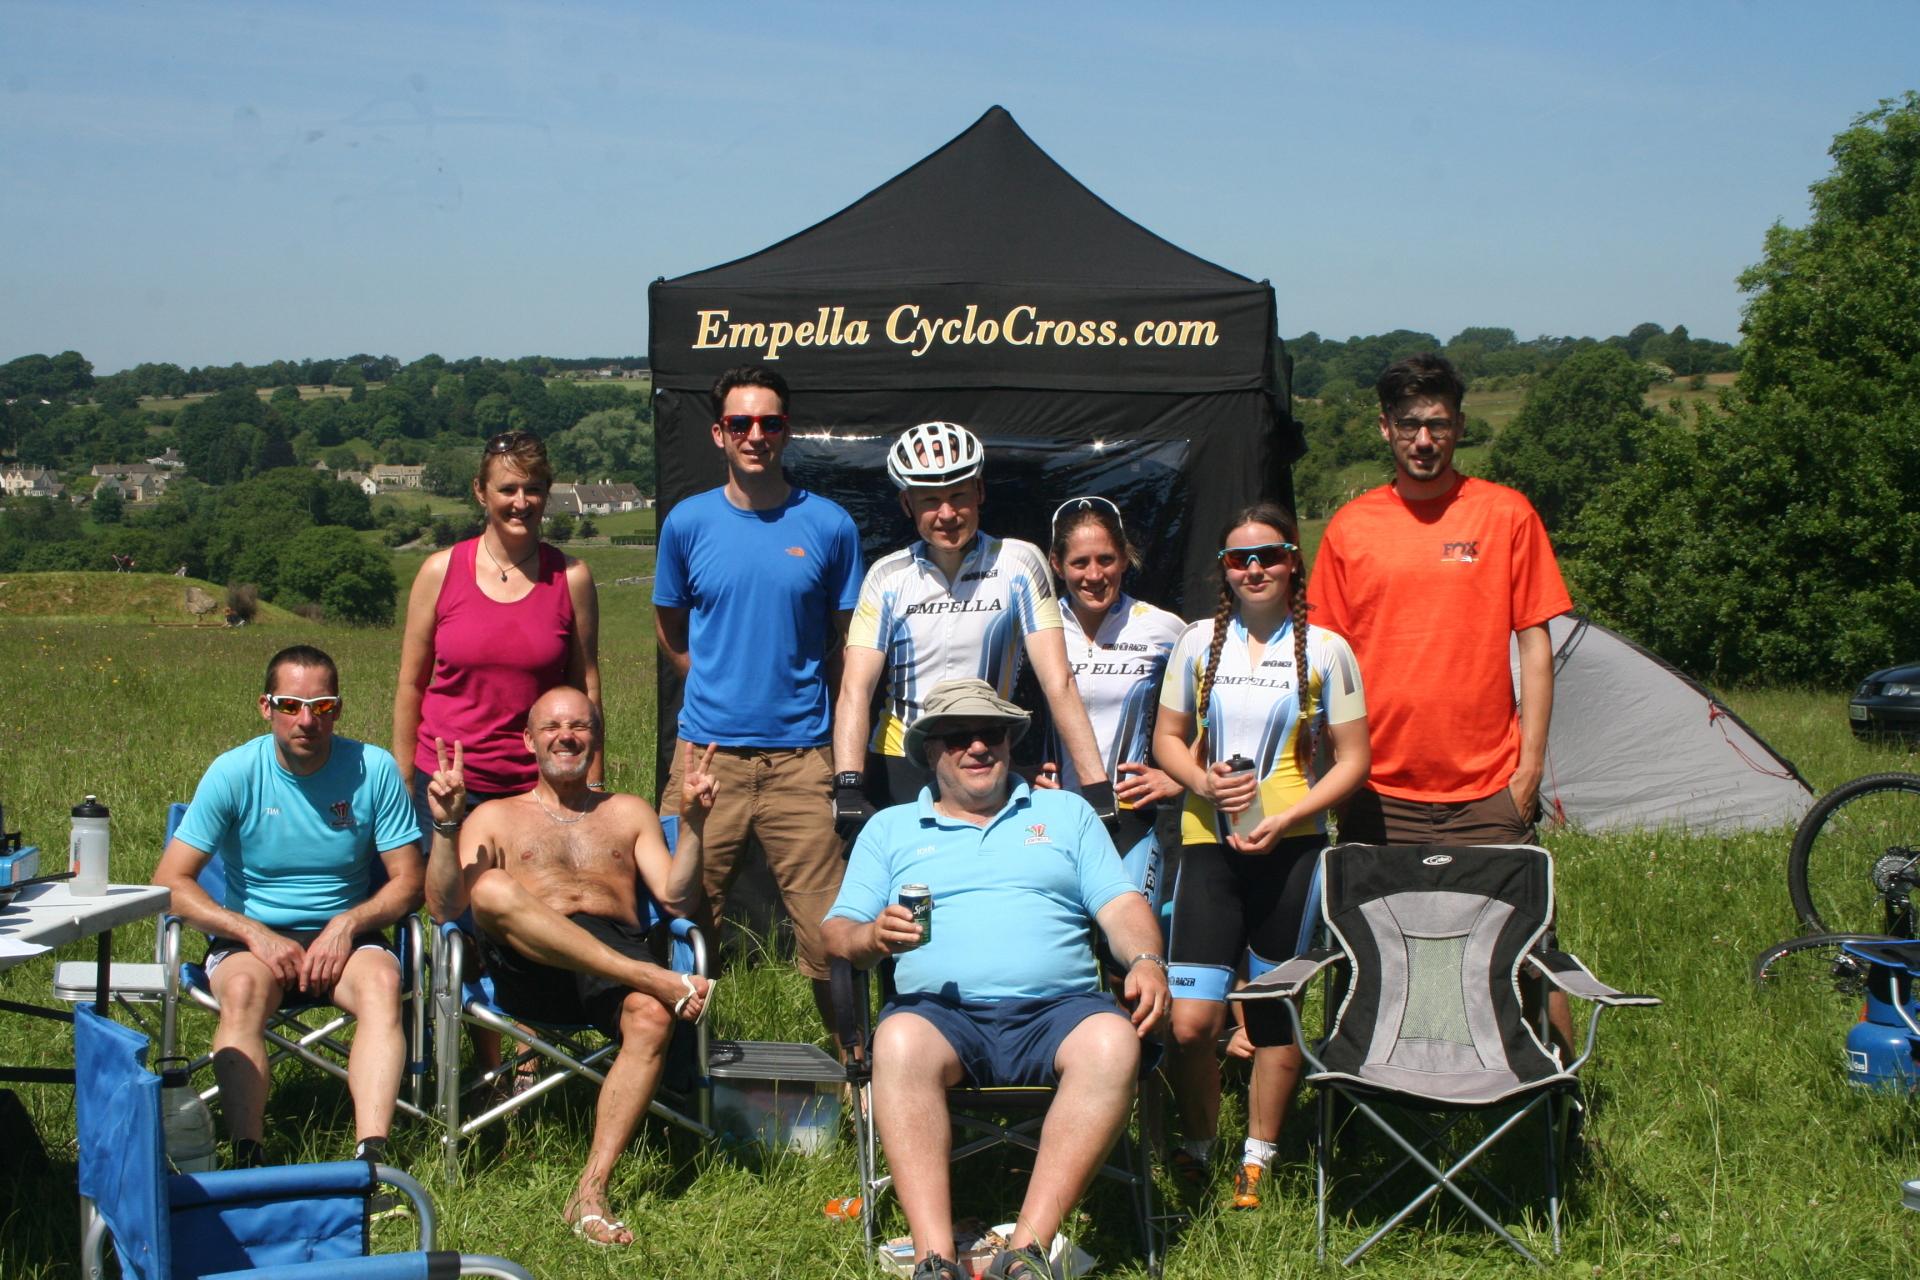 Team Empella, John Holmes, Mountain Mayhem, Xan Crees, Ben Eedy, Kate George